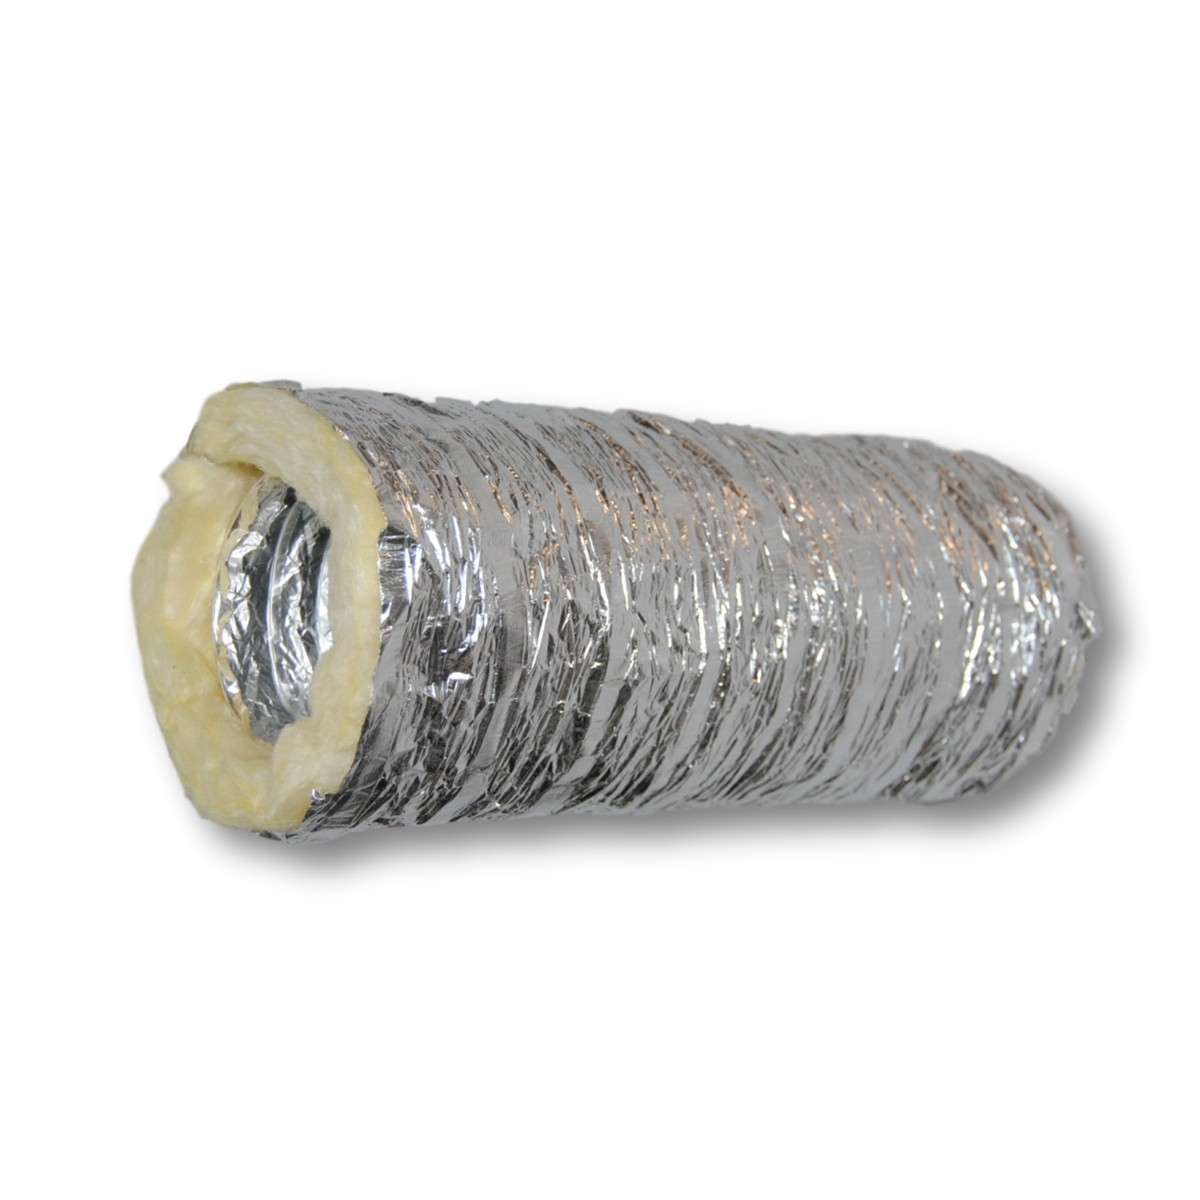 Tubos para chimeneas dinak mm flexible acero inox with - Tubo de chimenea ...